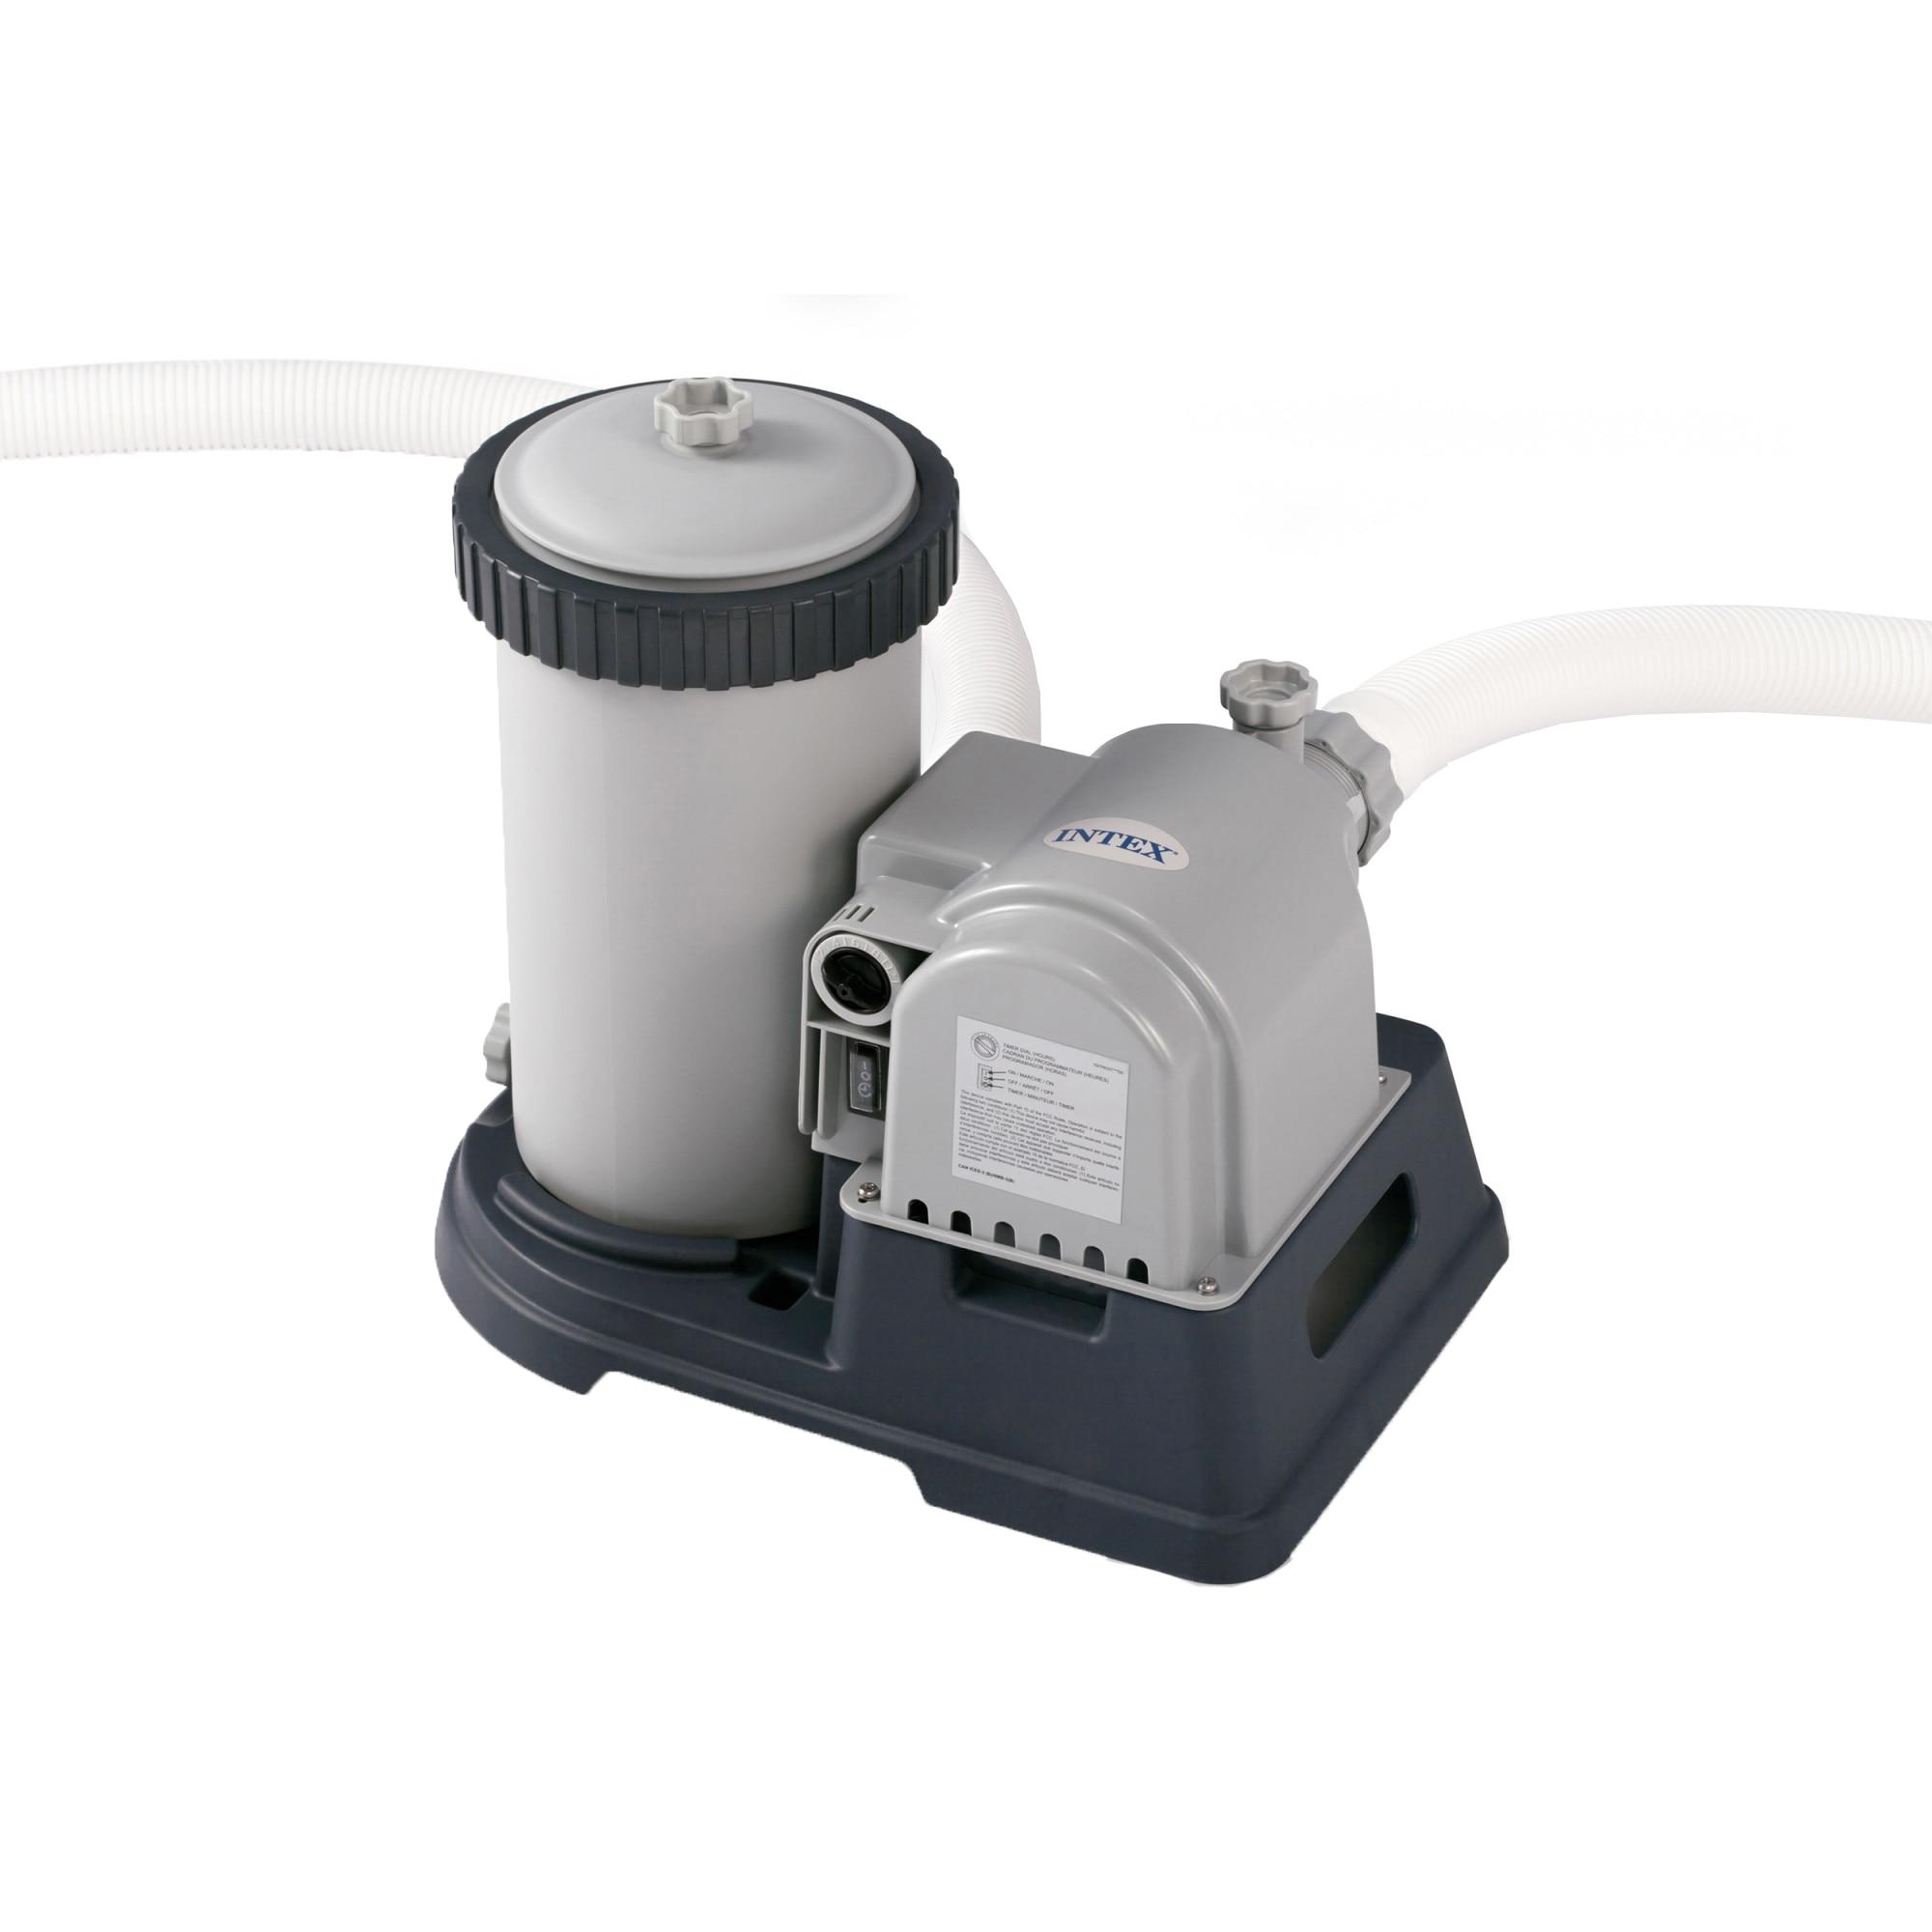 Fotografie Filtru apa Intex 28634, 220-240 V, 38 mm diametru, 9.463 l/h debit apa, pentru piscine pana la 50 m3